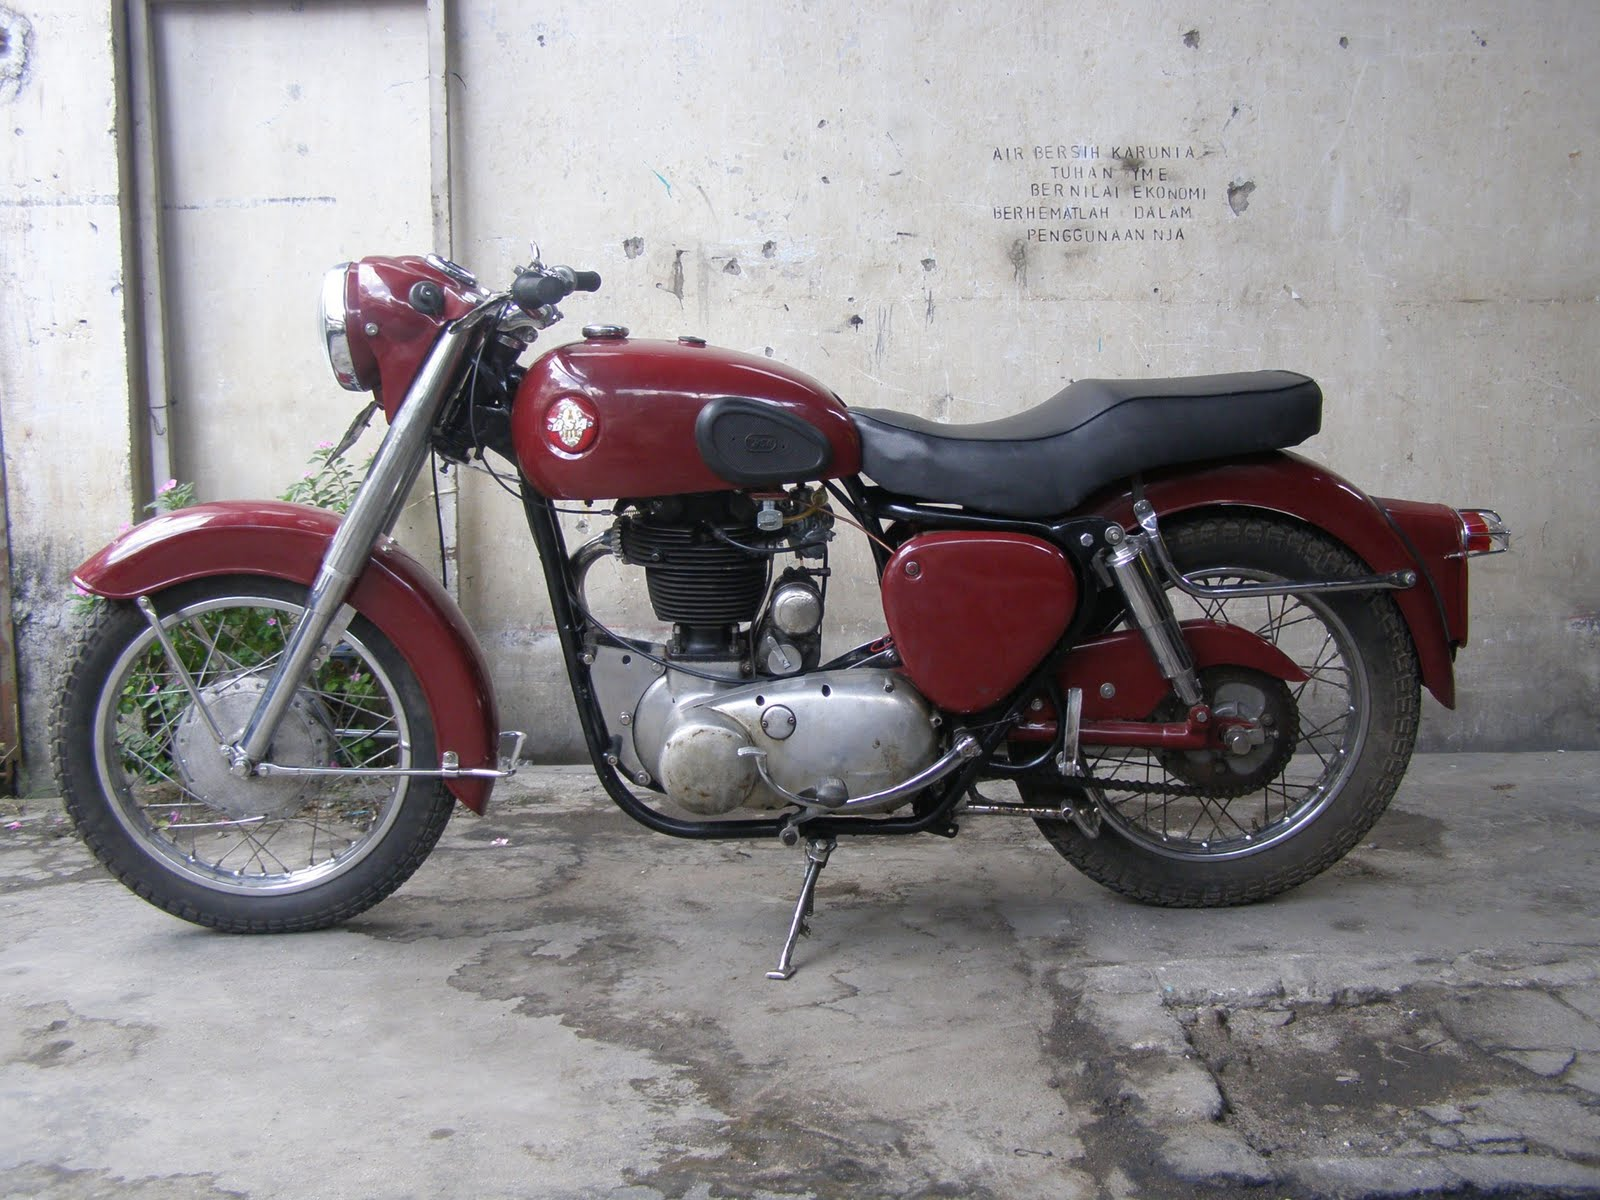 Motor Klasik Sepeda Tel Dan Barang Antik Dijual BSA Plastik Cc